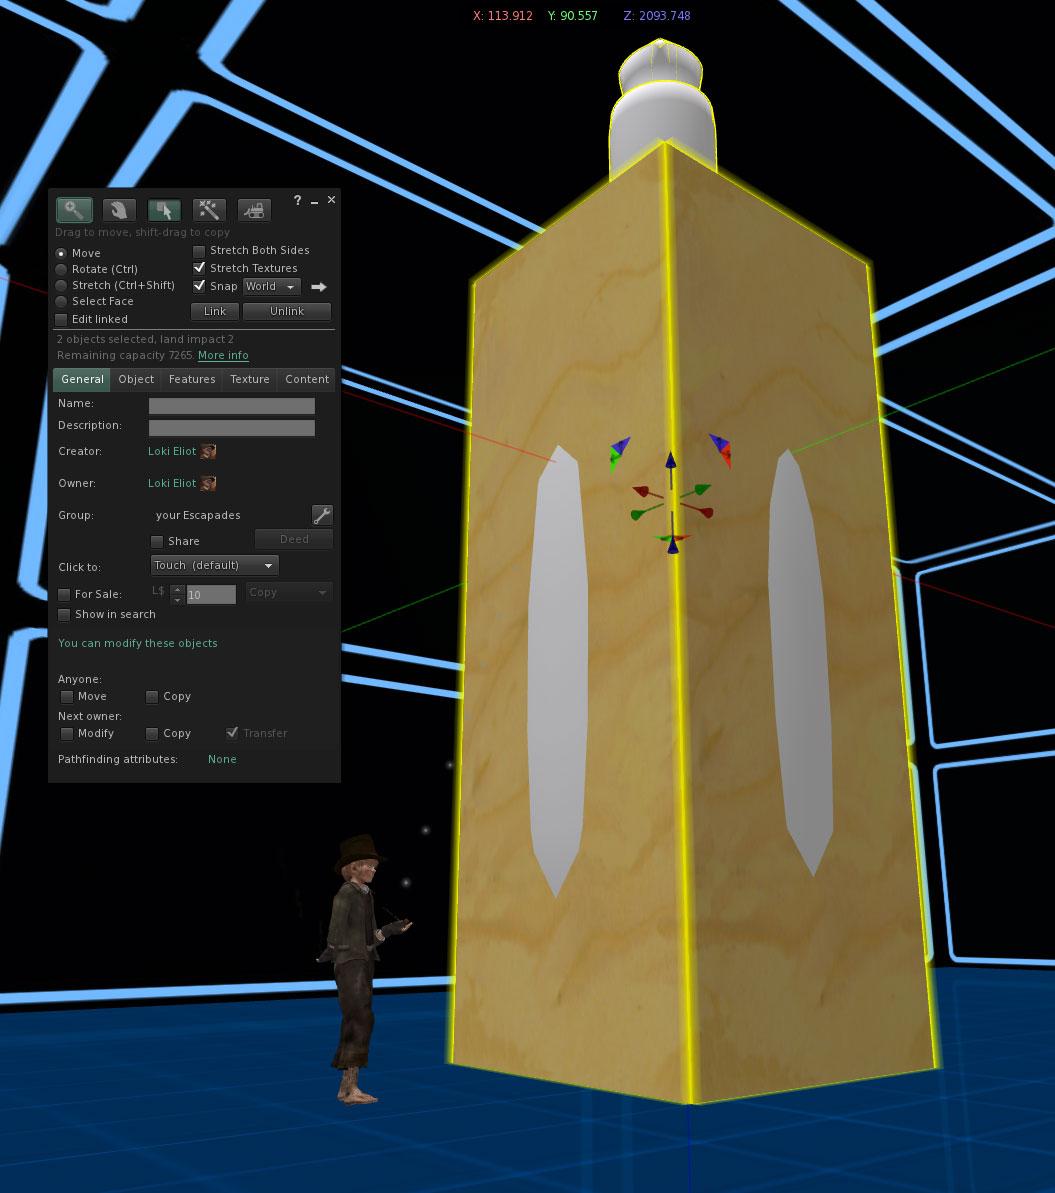 The Secrets of Mesh Landimpact – Loki – Digital Mischief Maker